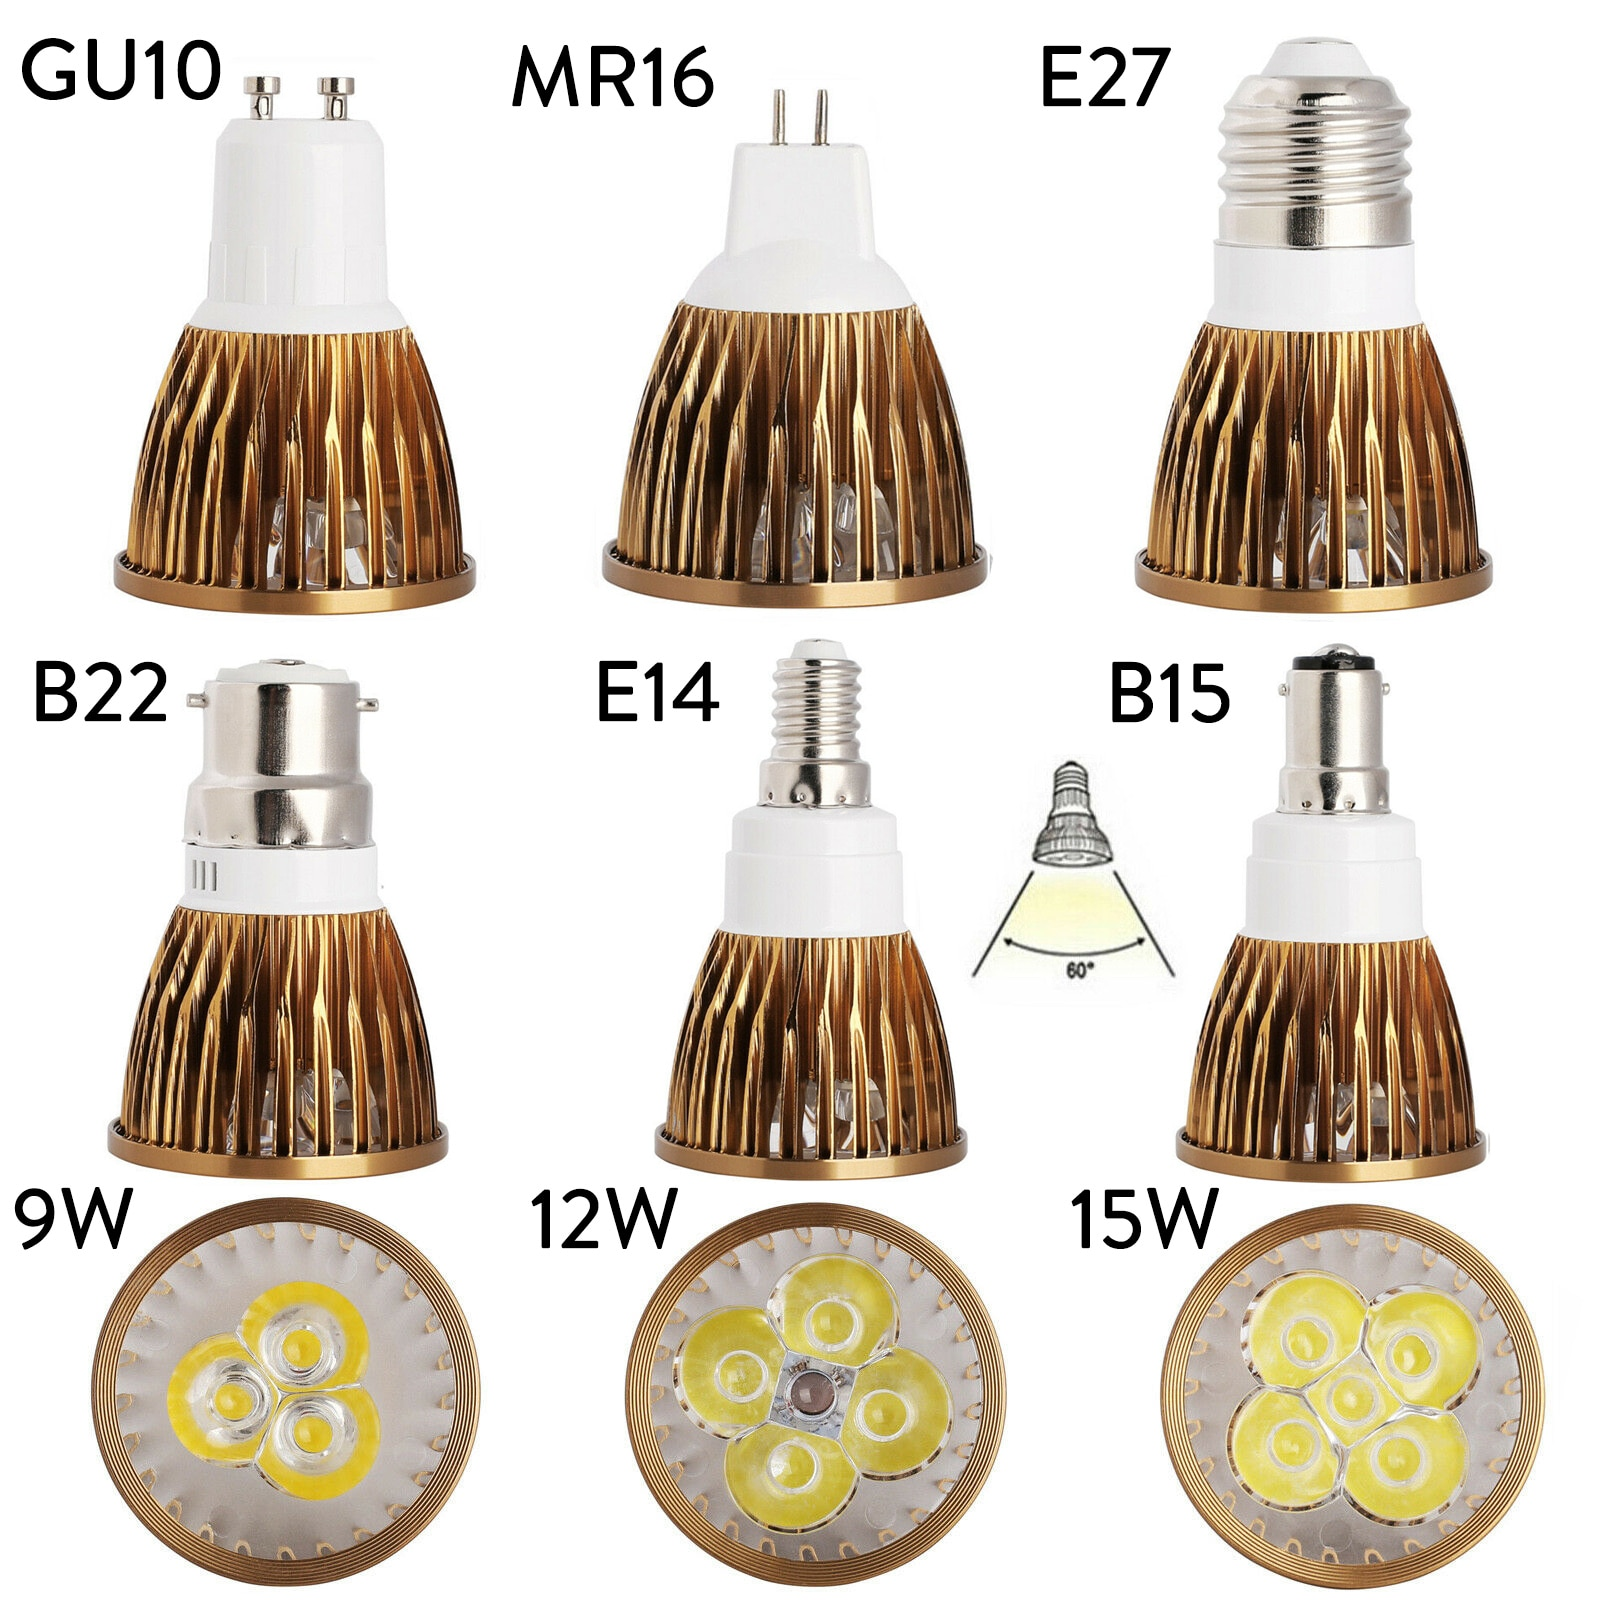 1 Uds. Bombillas LED superbrillantes regulables GU10 MR16 E27 E14 GU5.3 B22 B15 AC 110V 220V DC 12V lámpara para el hogar Oficina Luz